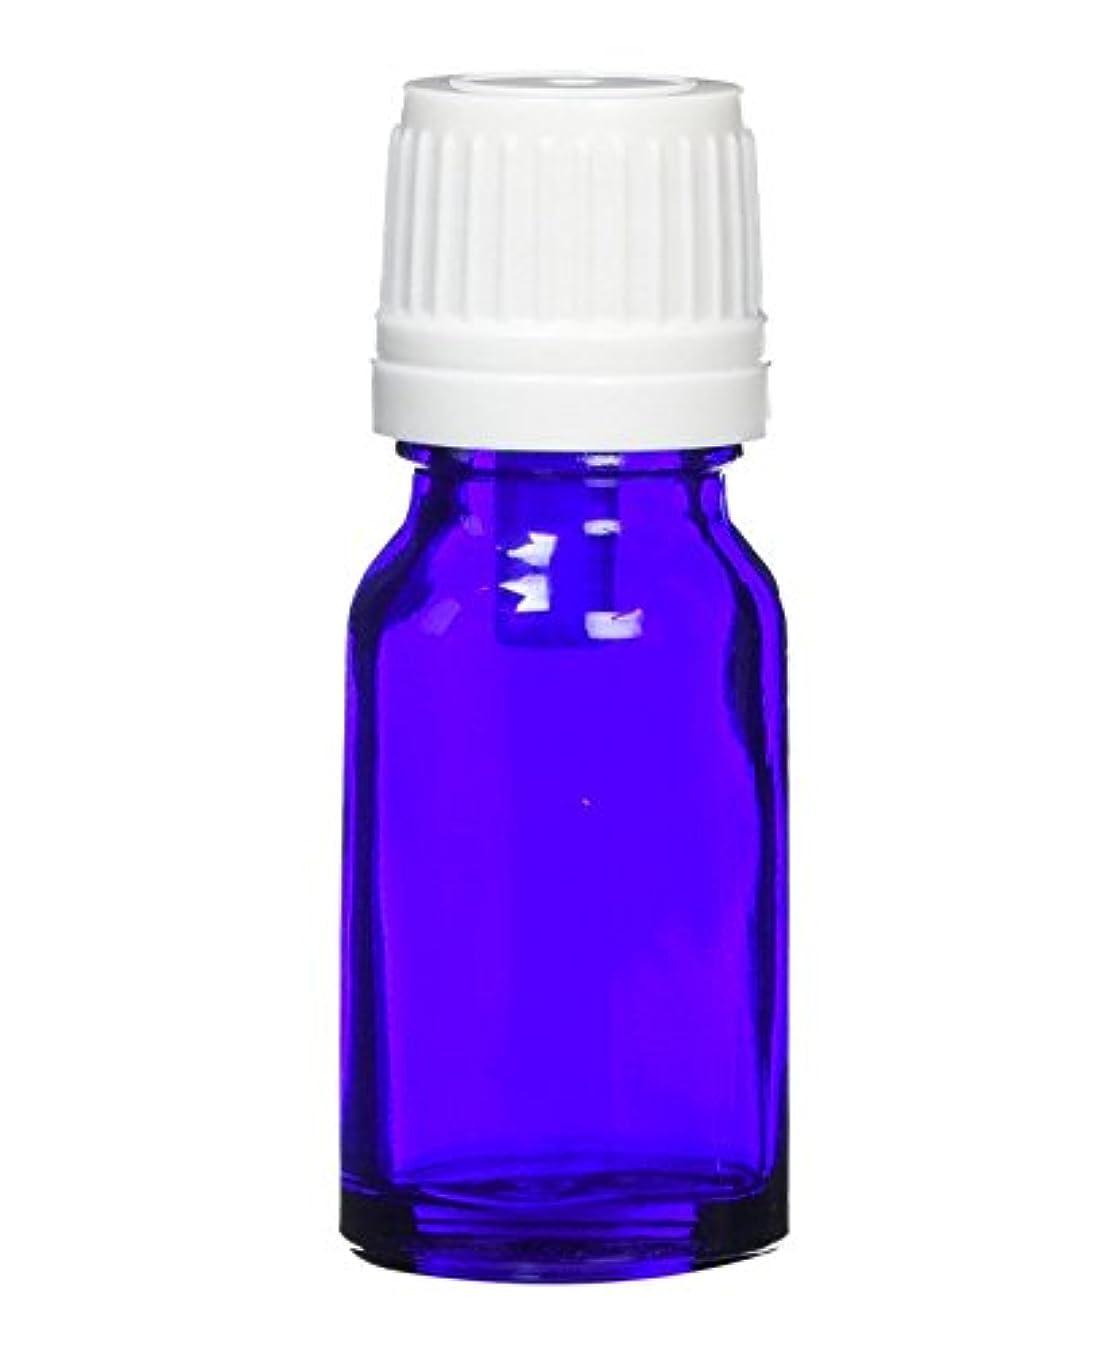 ease 遮光ビン ブルー (高粘度用) 10ml(国産) ×5本